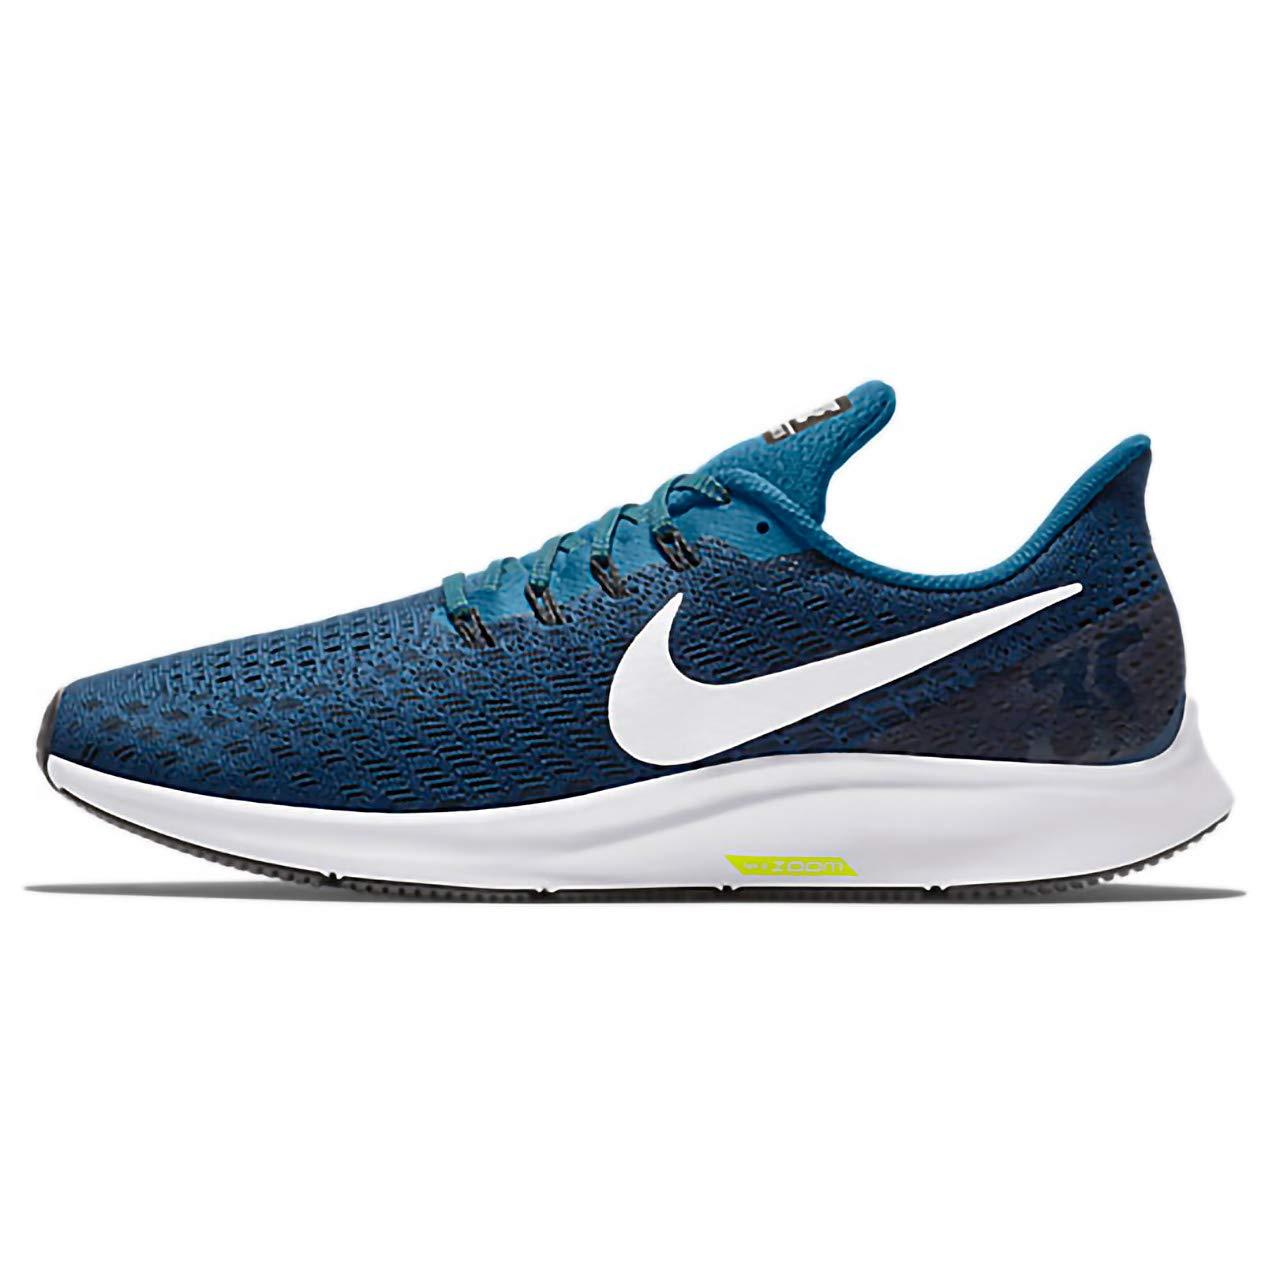 separation shoes ce61e 74c96 Galleon - NIKE Men s Air Zoom Pegasus 35 Running Shoes (11 D US, Blue Force  White Black Wolf Grey)